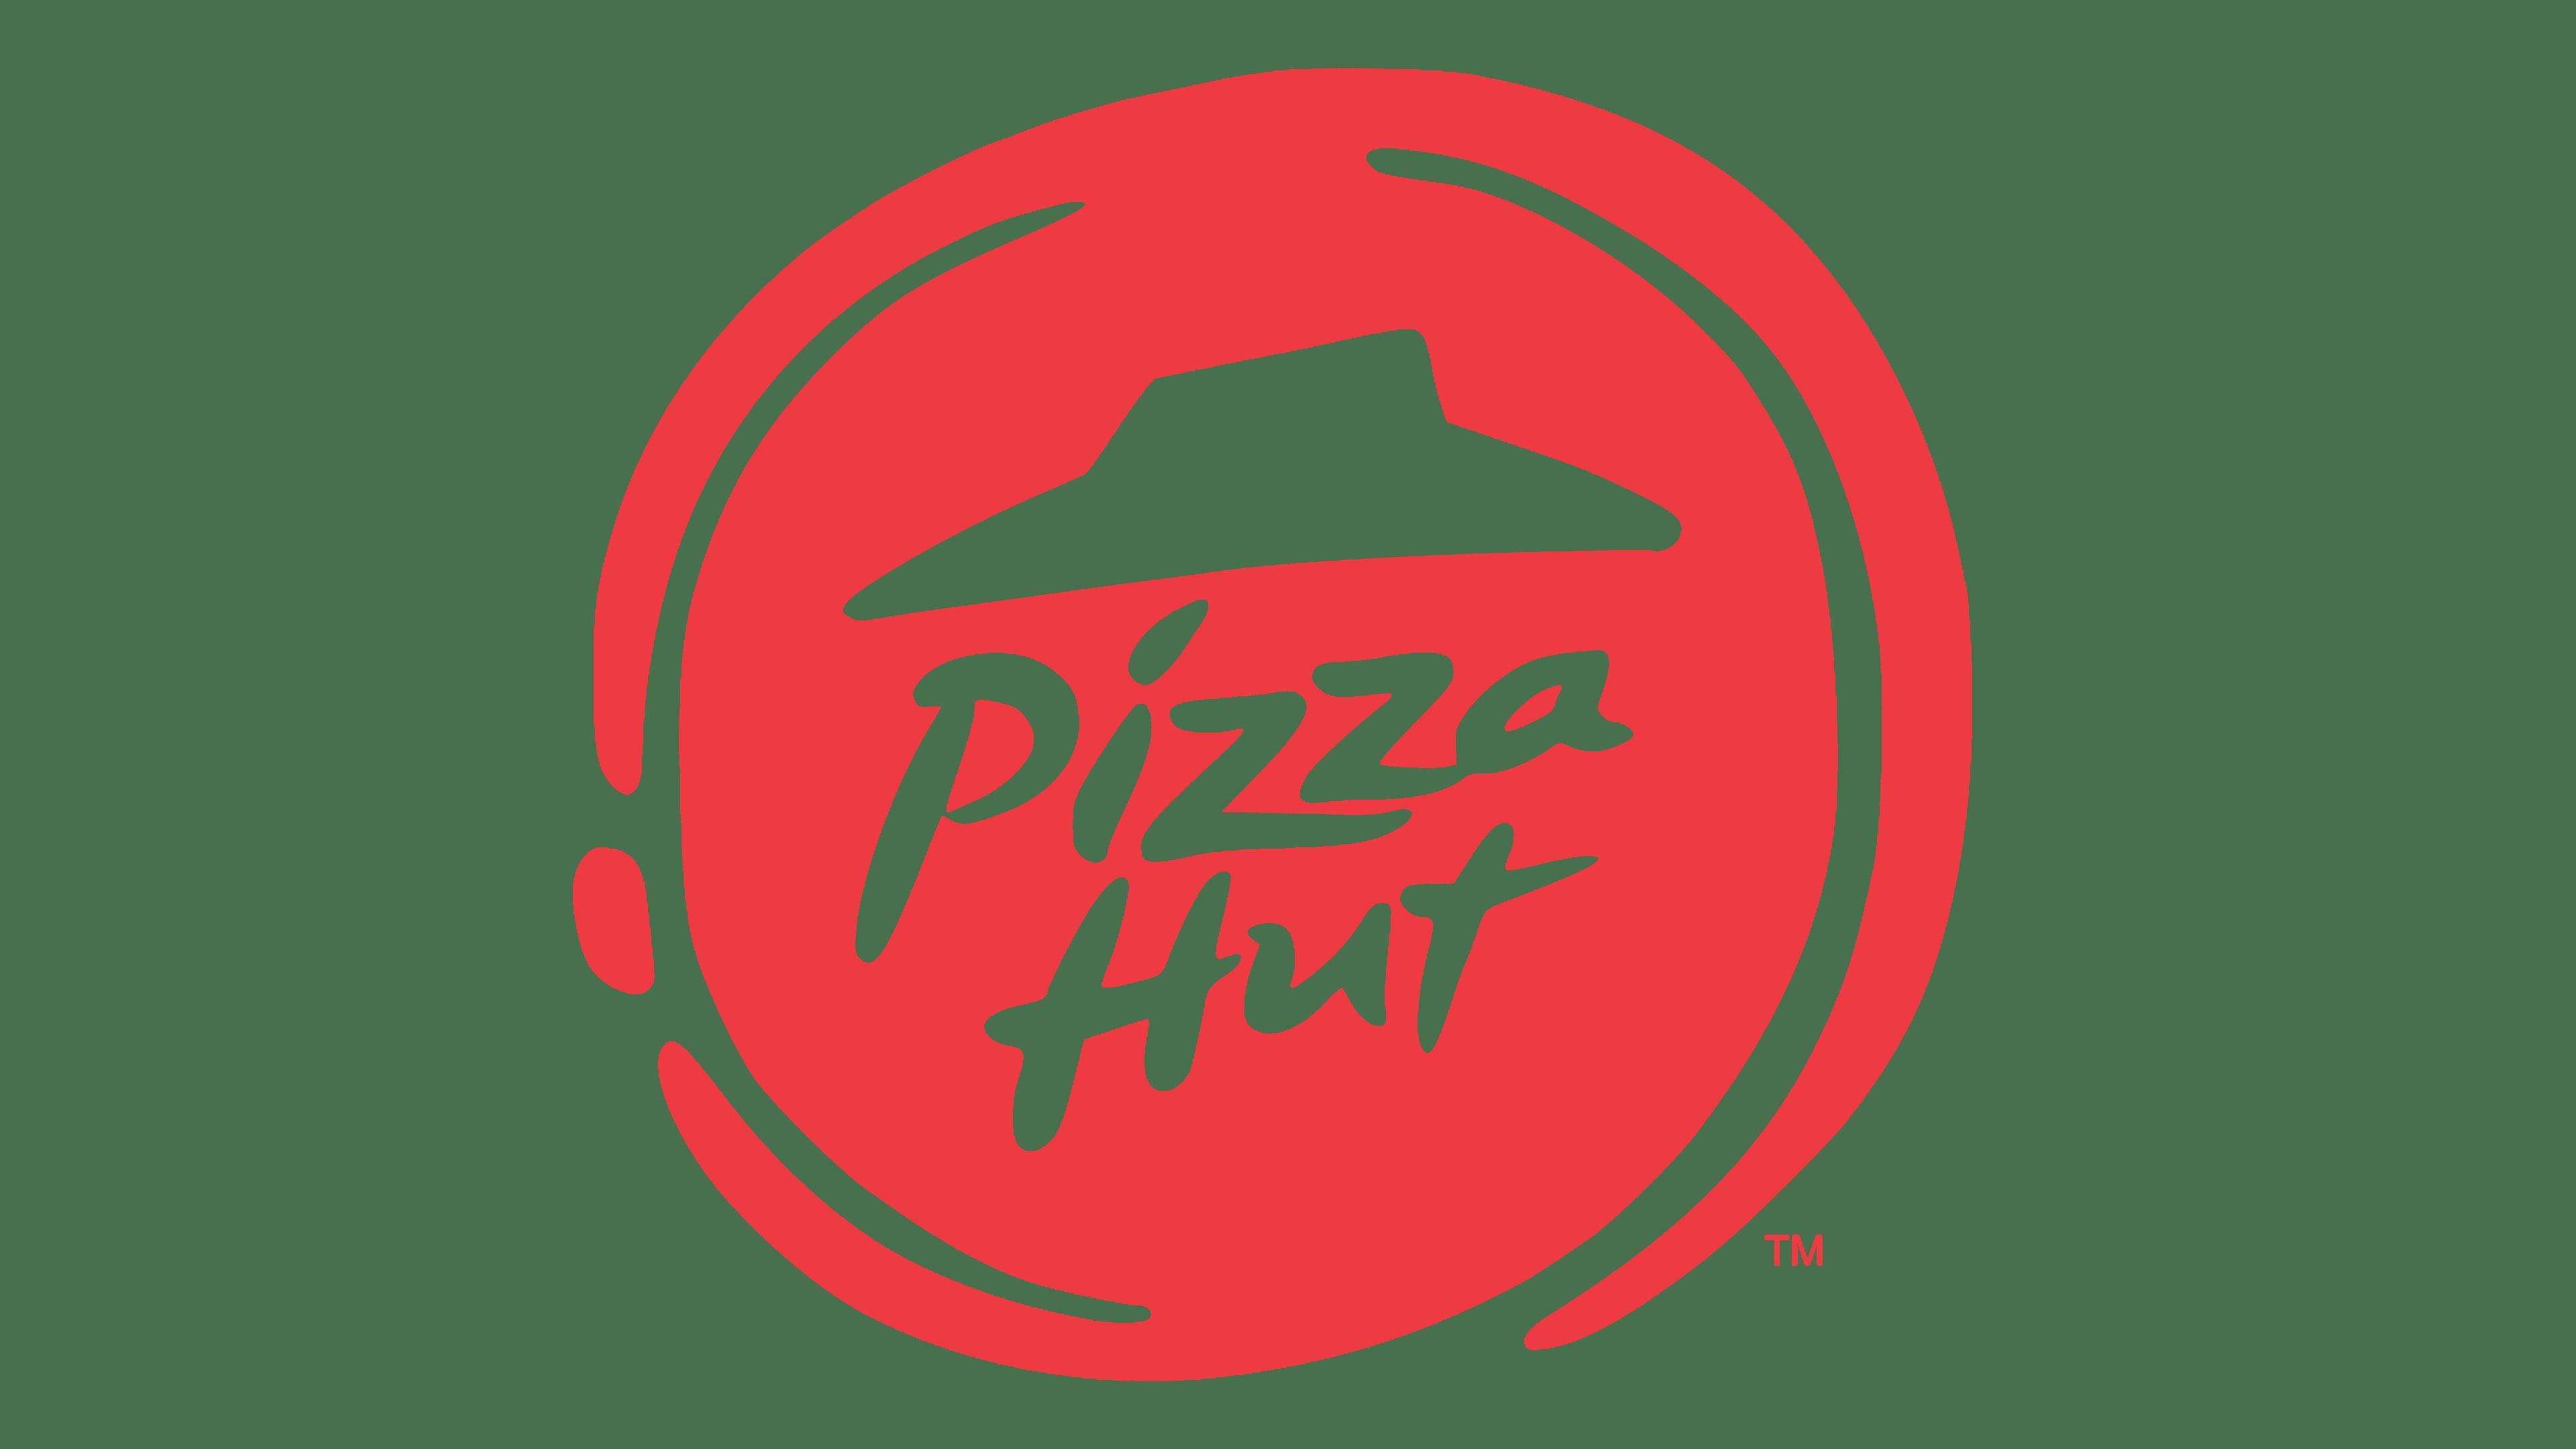 Pizza Hut Logo Logo